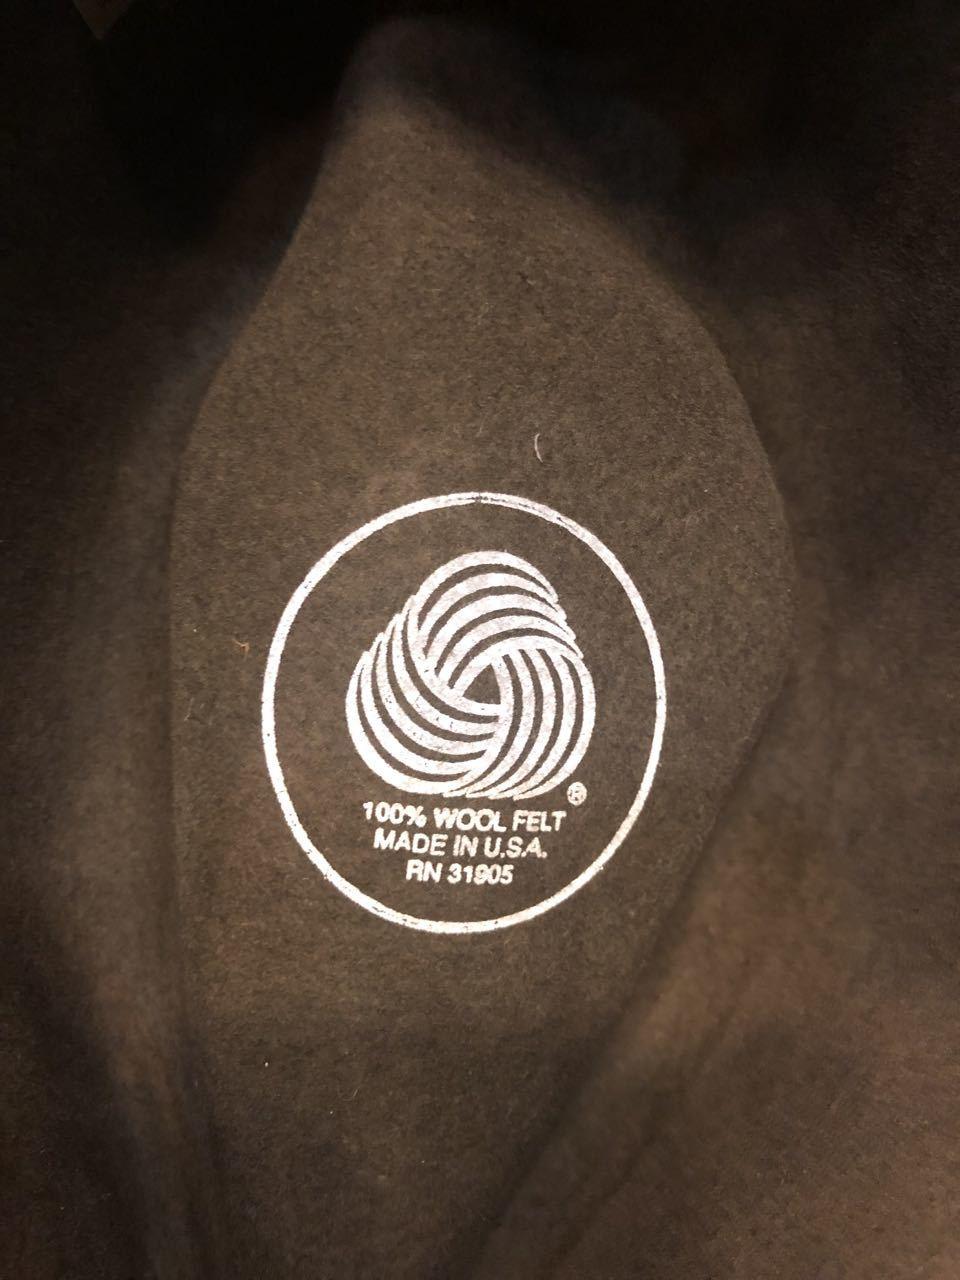 unknown 80s〜MADE IN U.S.A wool felt hat !_c0144020_18424452.jpg